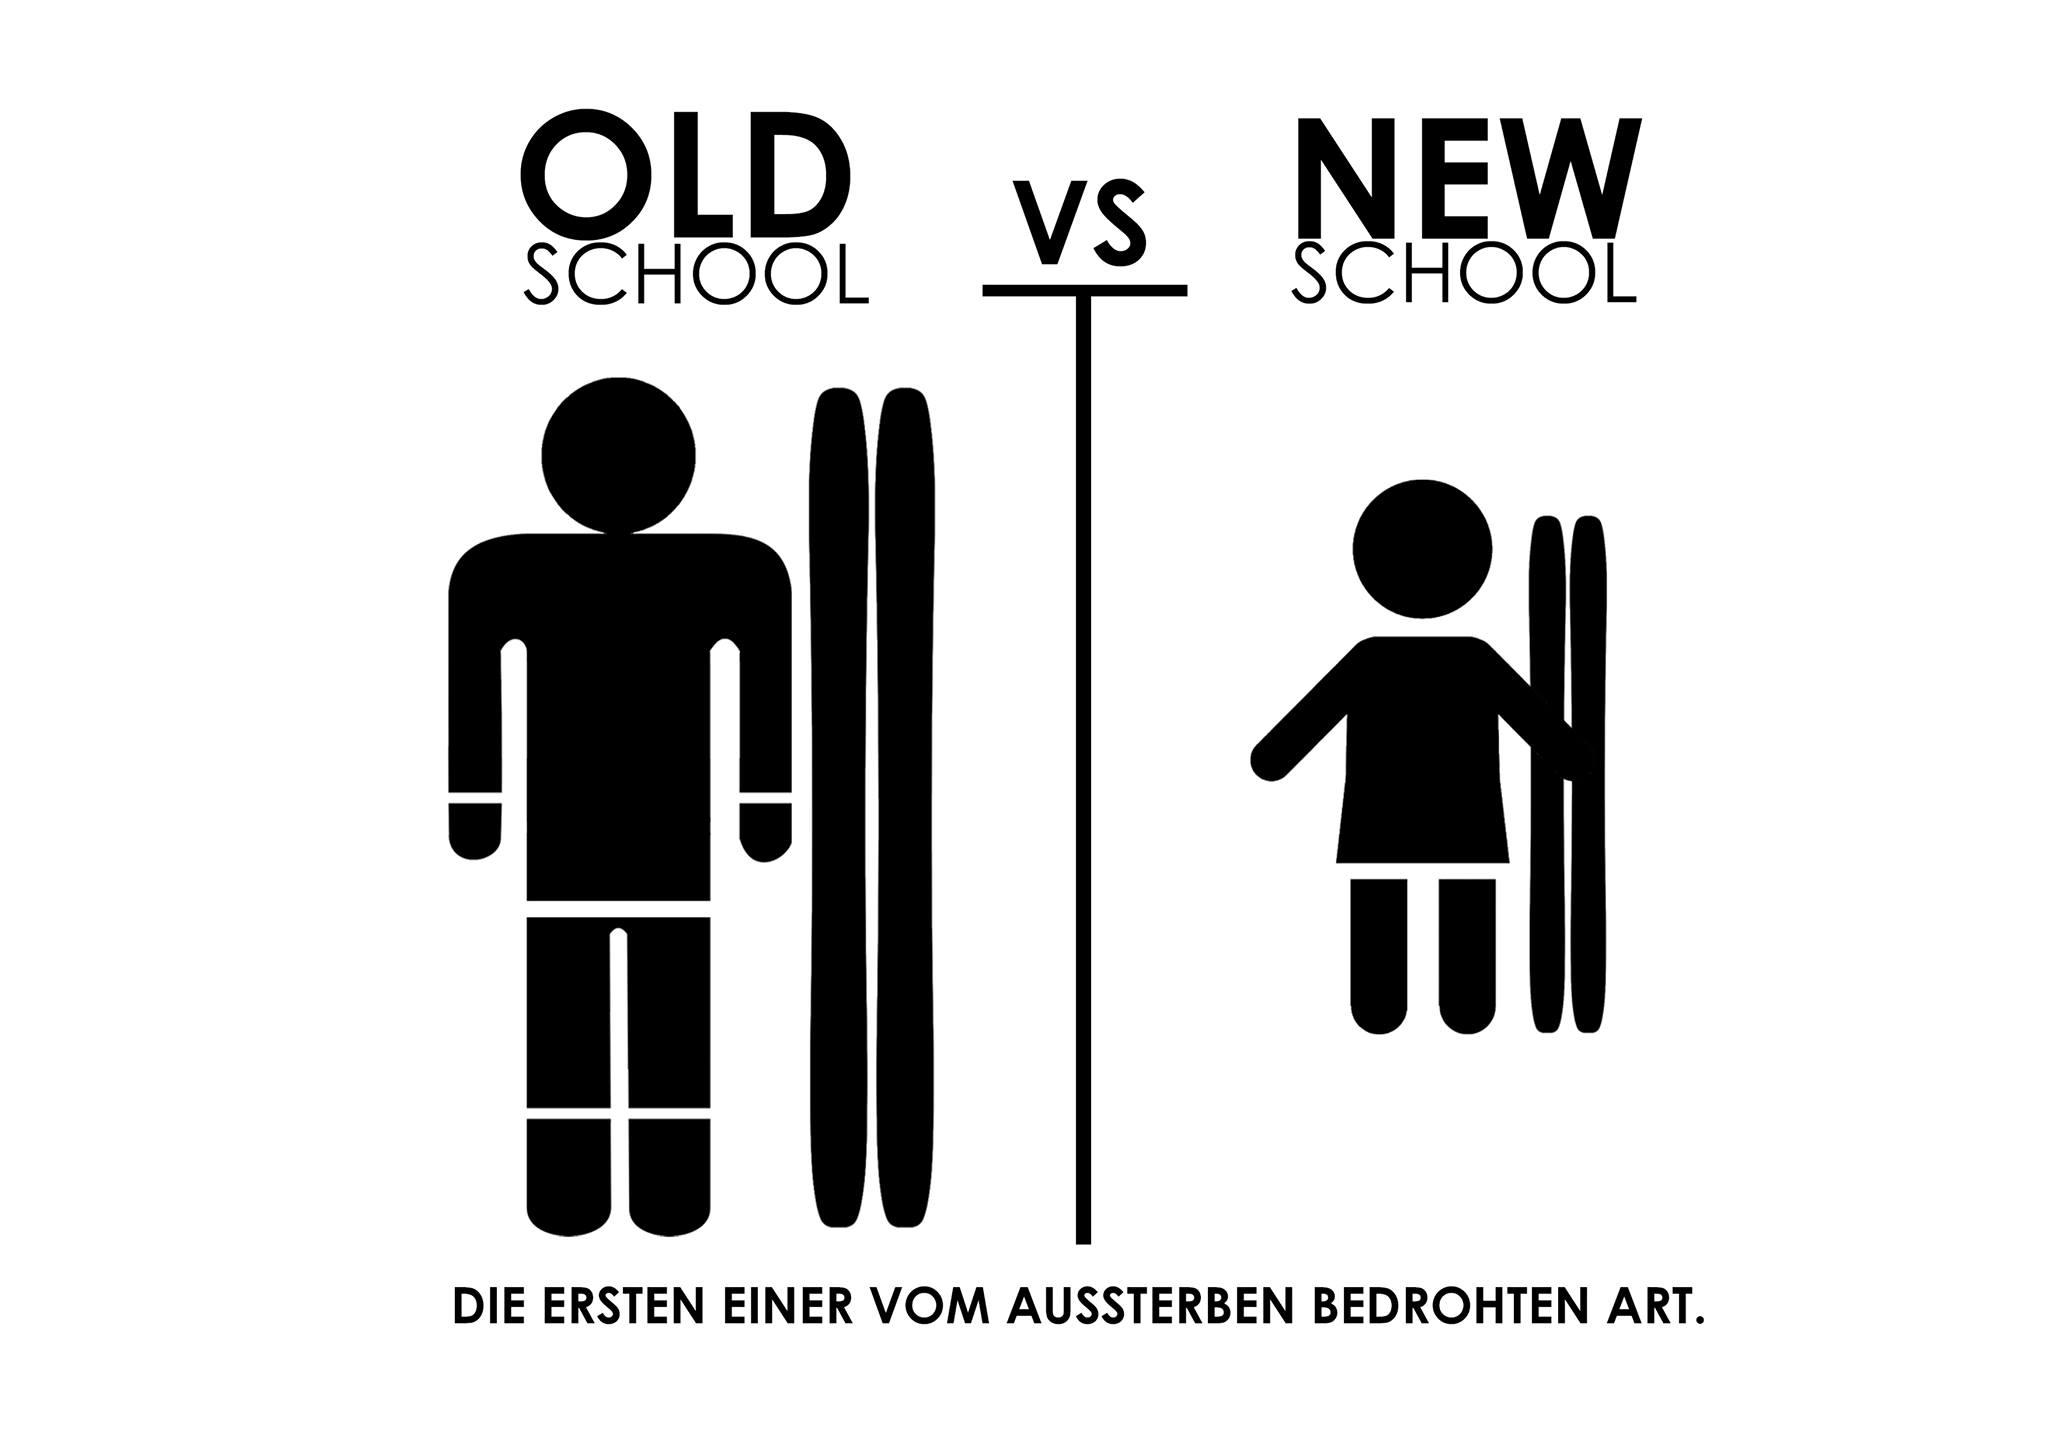 Härry Opinion: Old School vs. New School